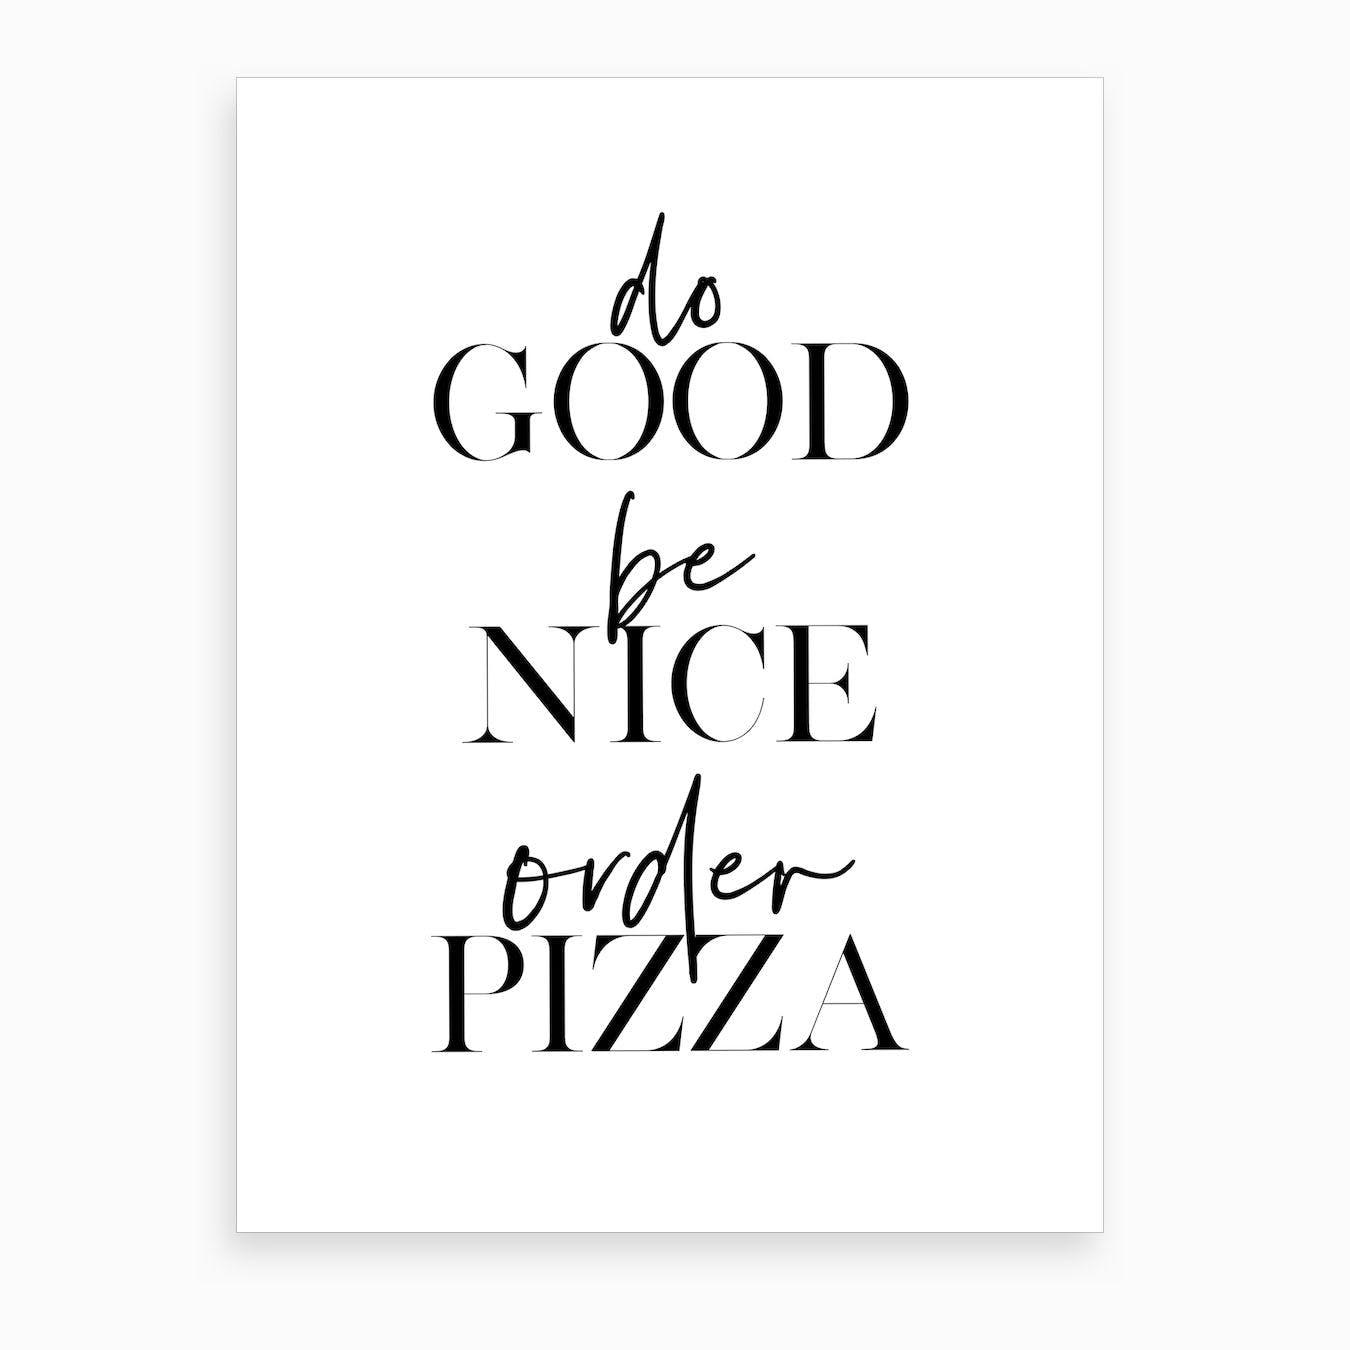 Order Pizza I Art Print